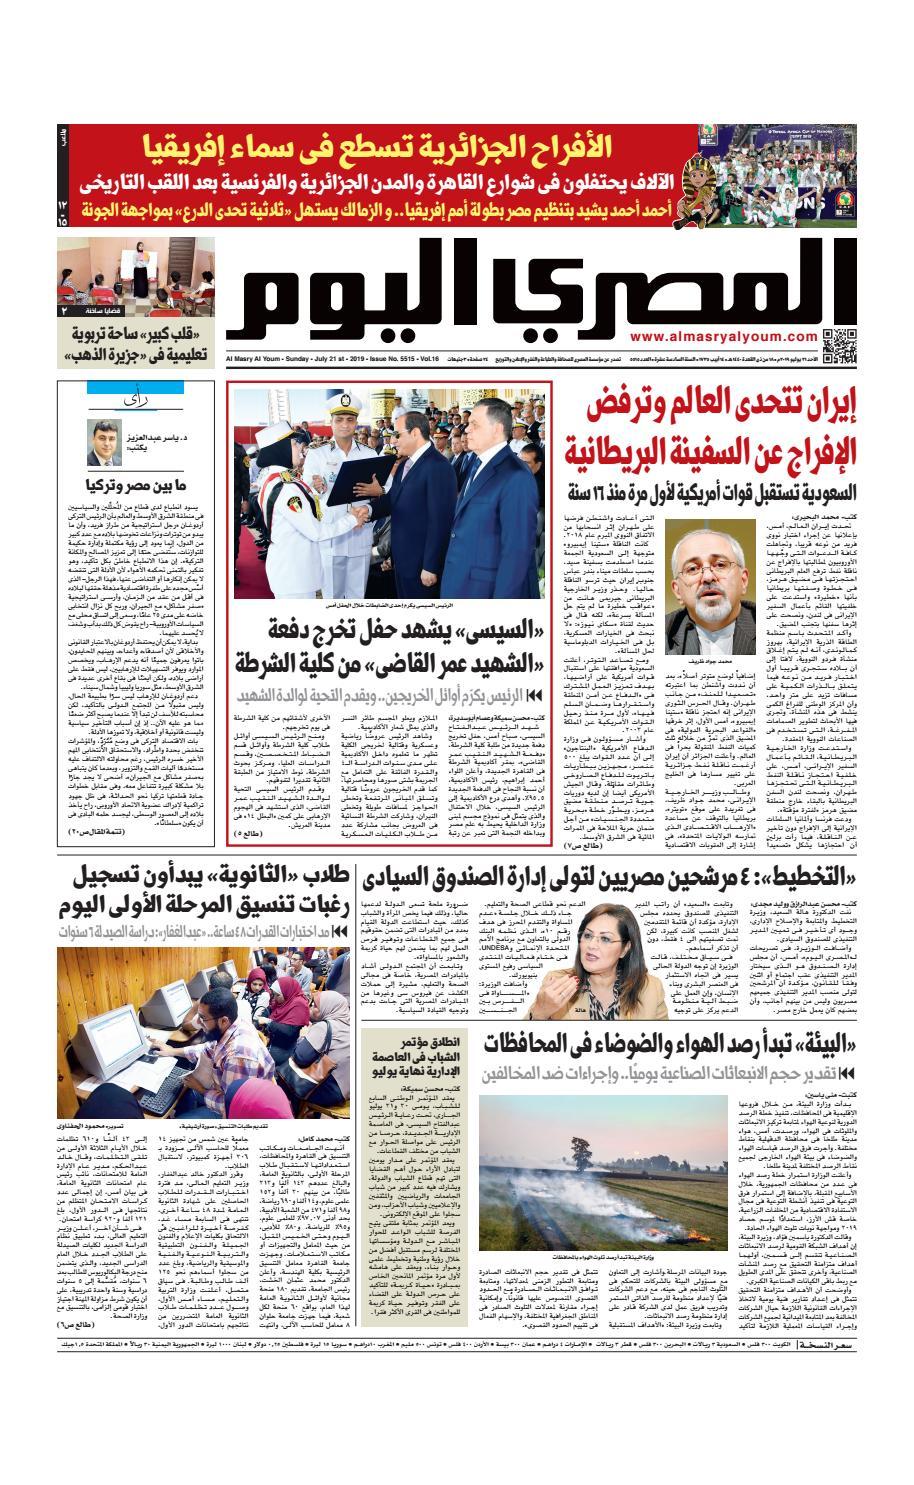 عدد الاحد 21 07 2019 By Al Masry Media Corp Issuu